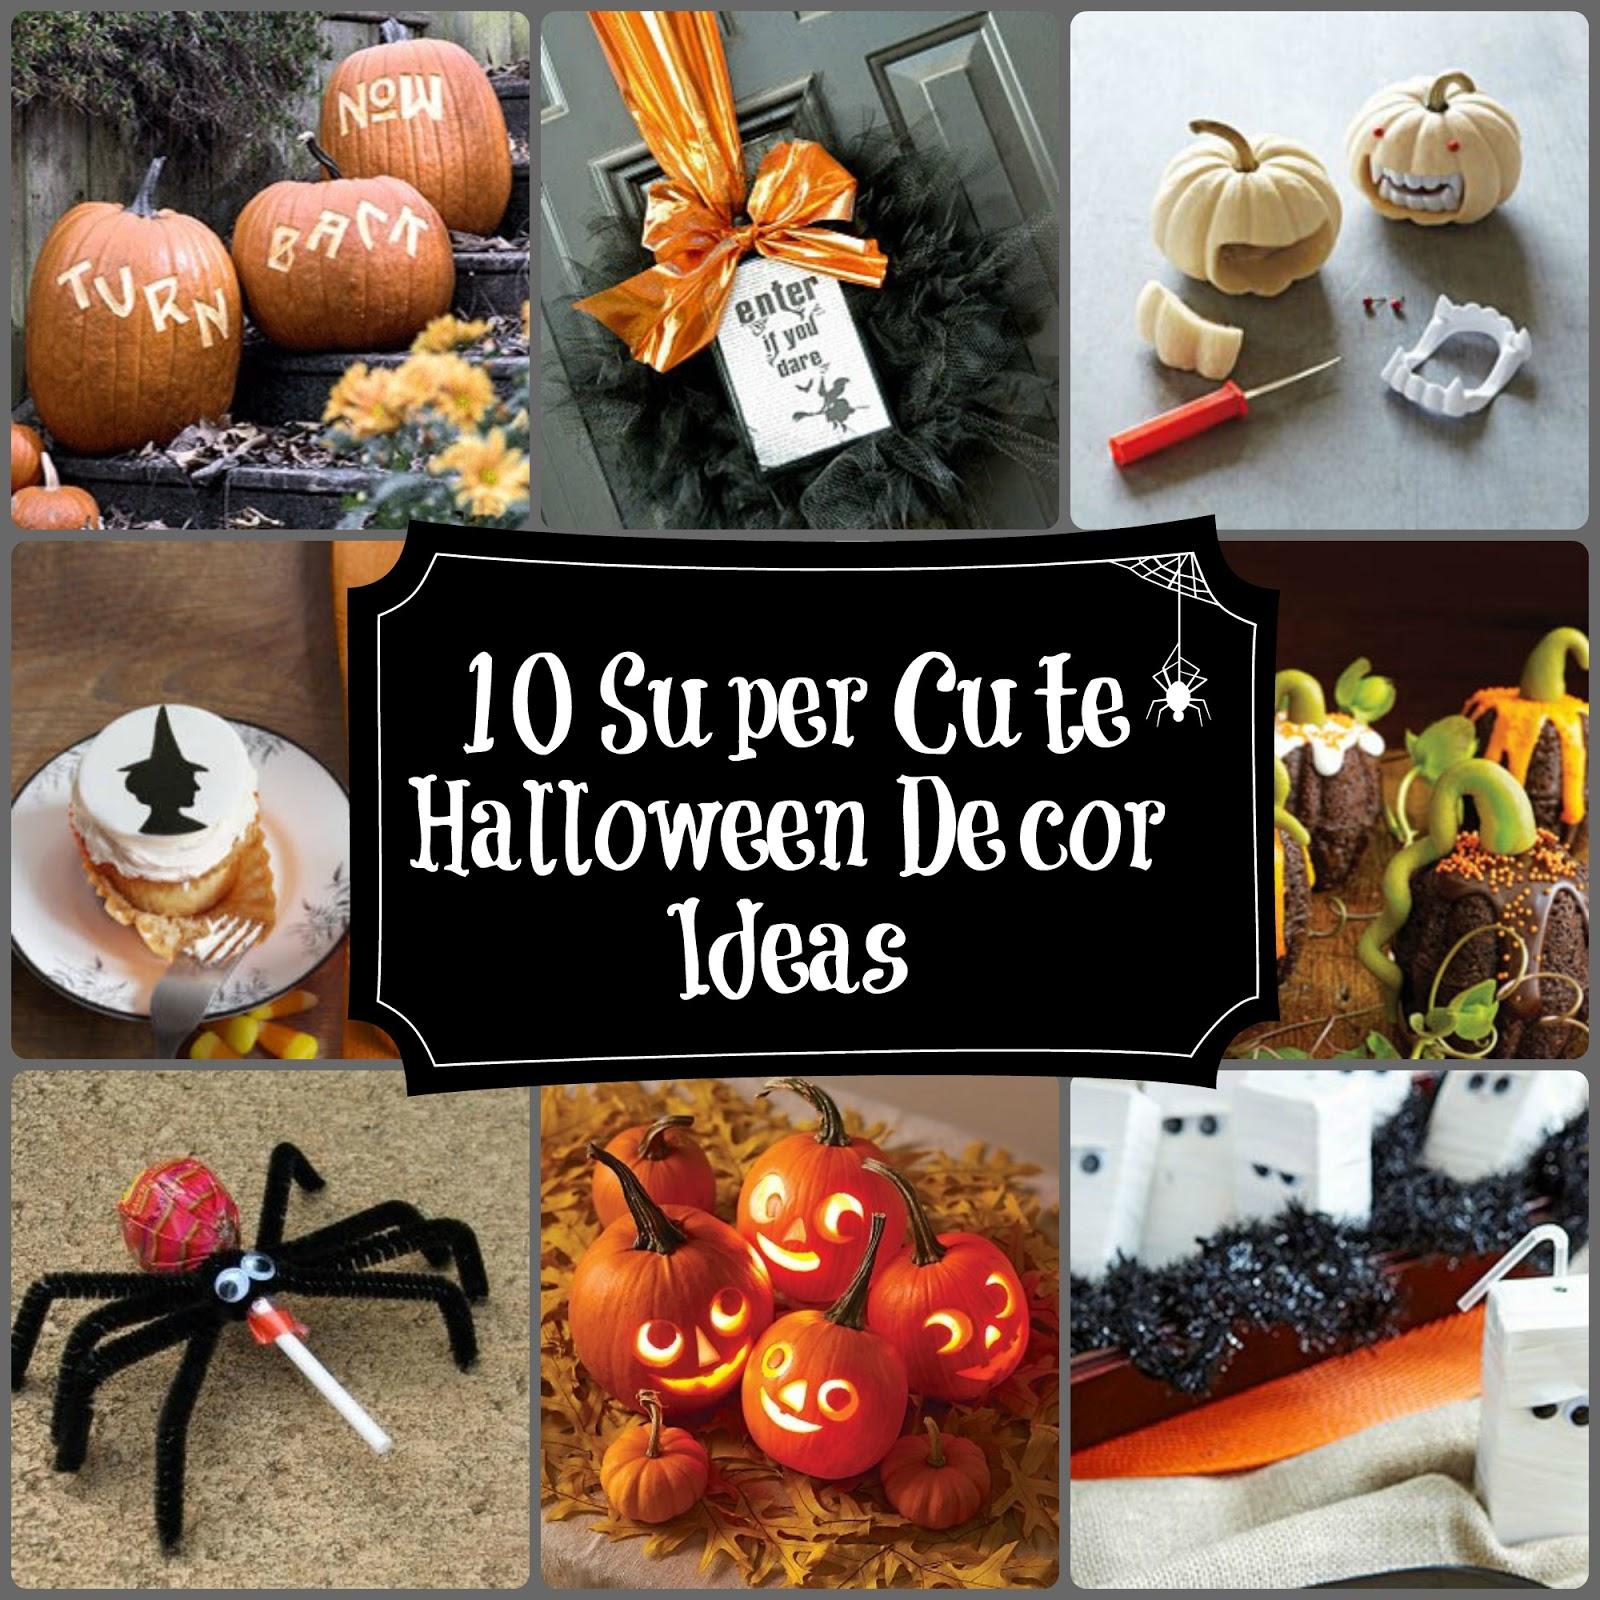 Cute Halloween Decorations Pinterest: Halloween IdeasLilacs And Longhorns